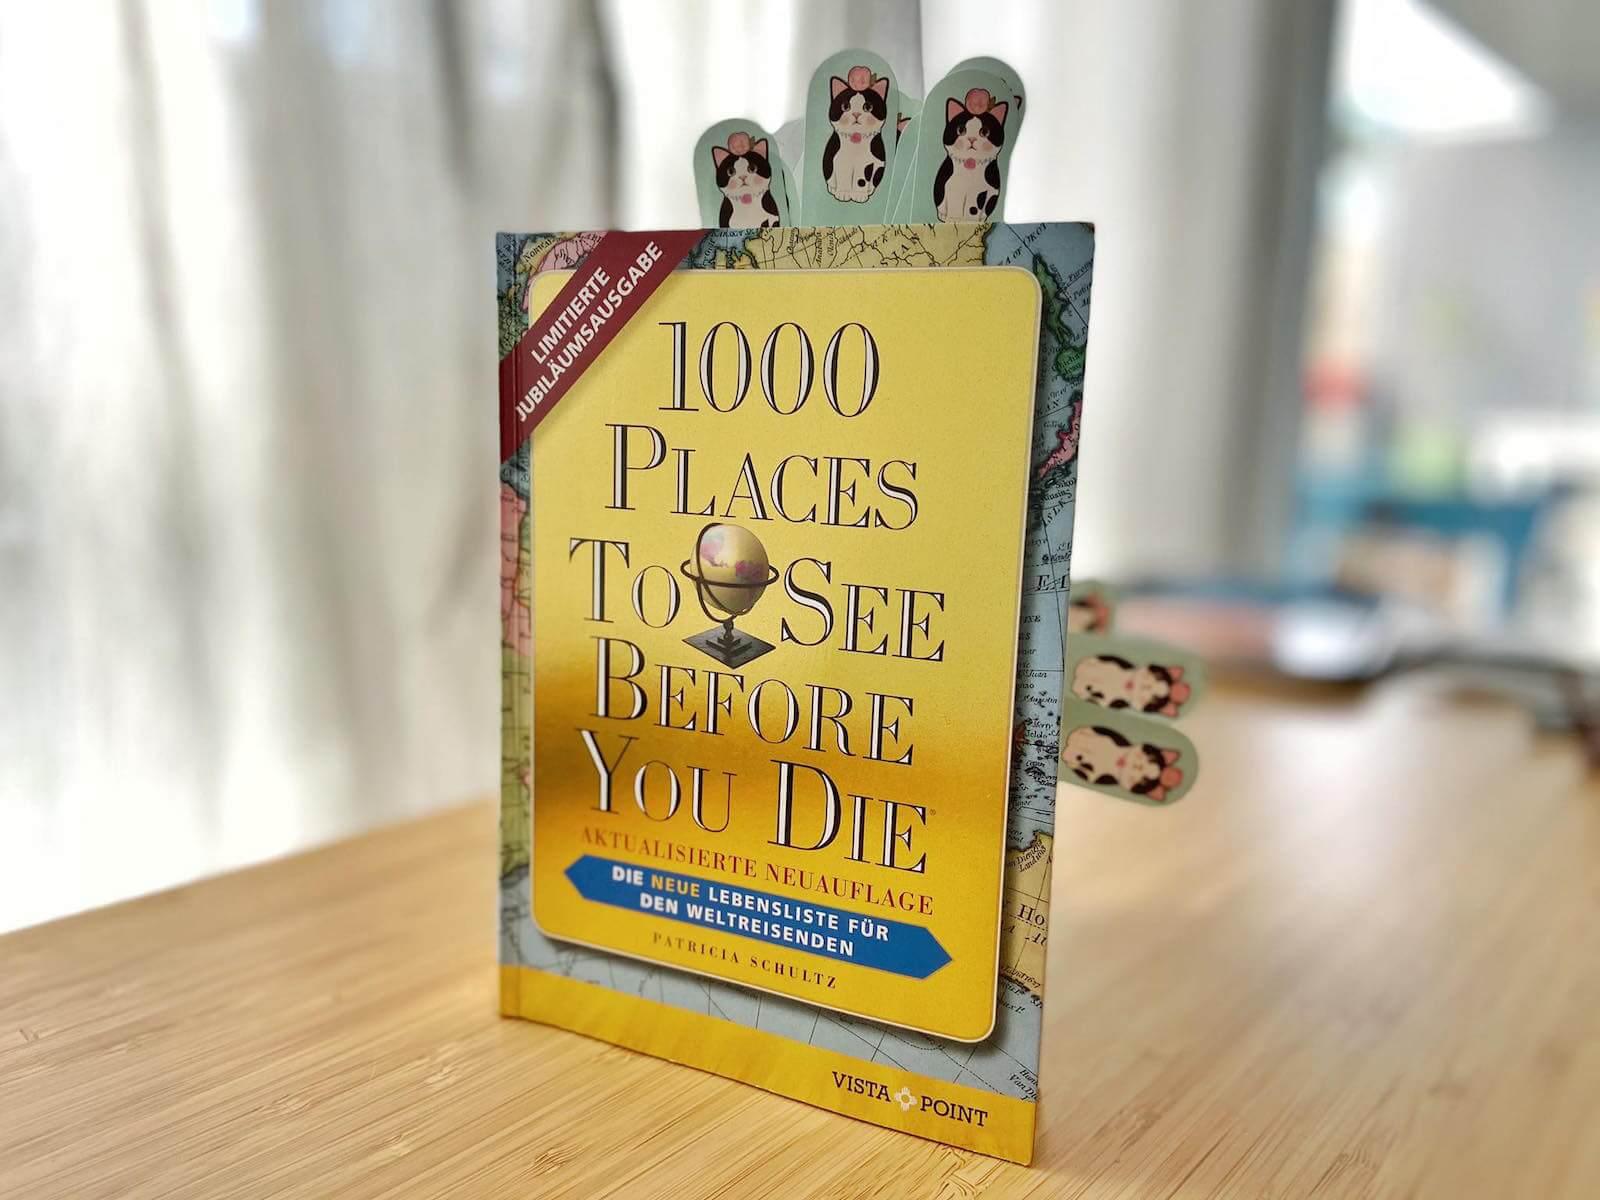 jubiläumsausgabe 1000 places to see before oyu die